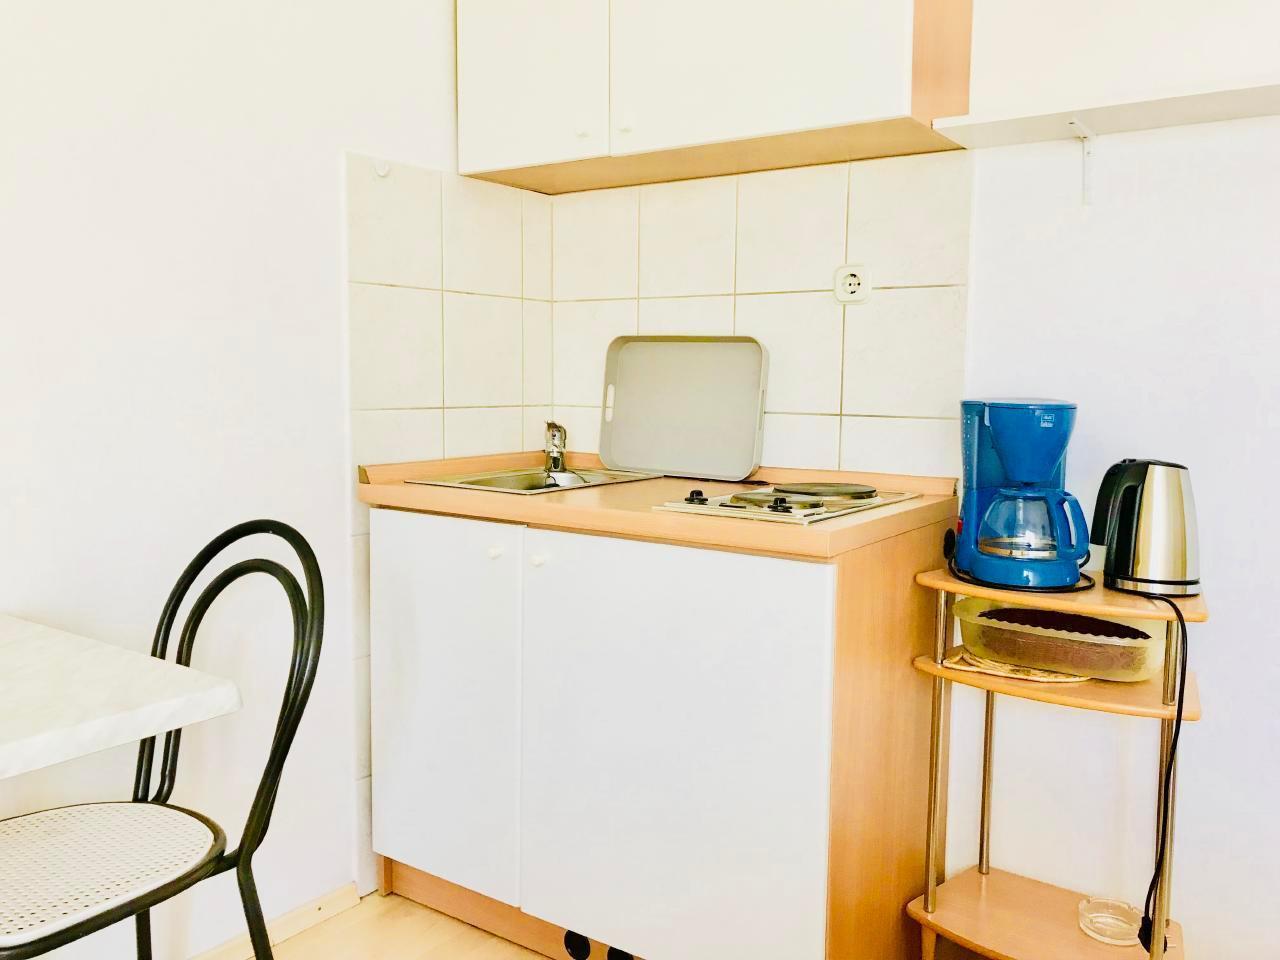 Ferienwohnung Apartmenthaus Ruza 1 - Studio (98389), Kaštel Štafilić, , Dalmatien, Kroatien, Bild 14